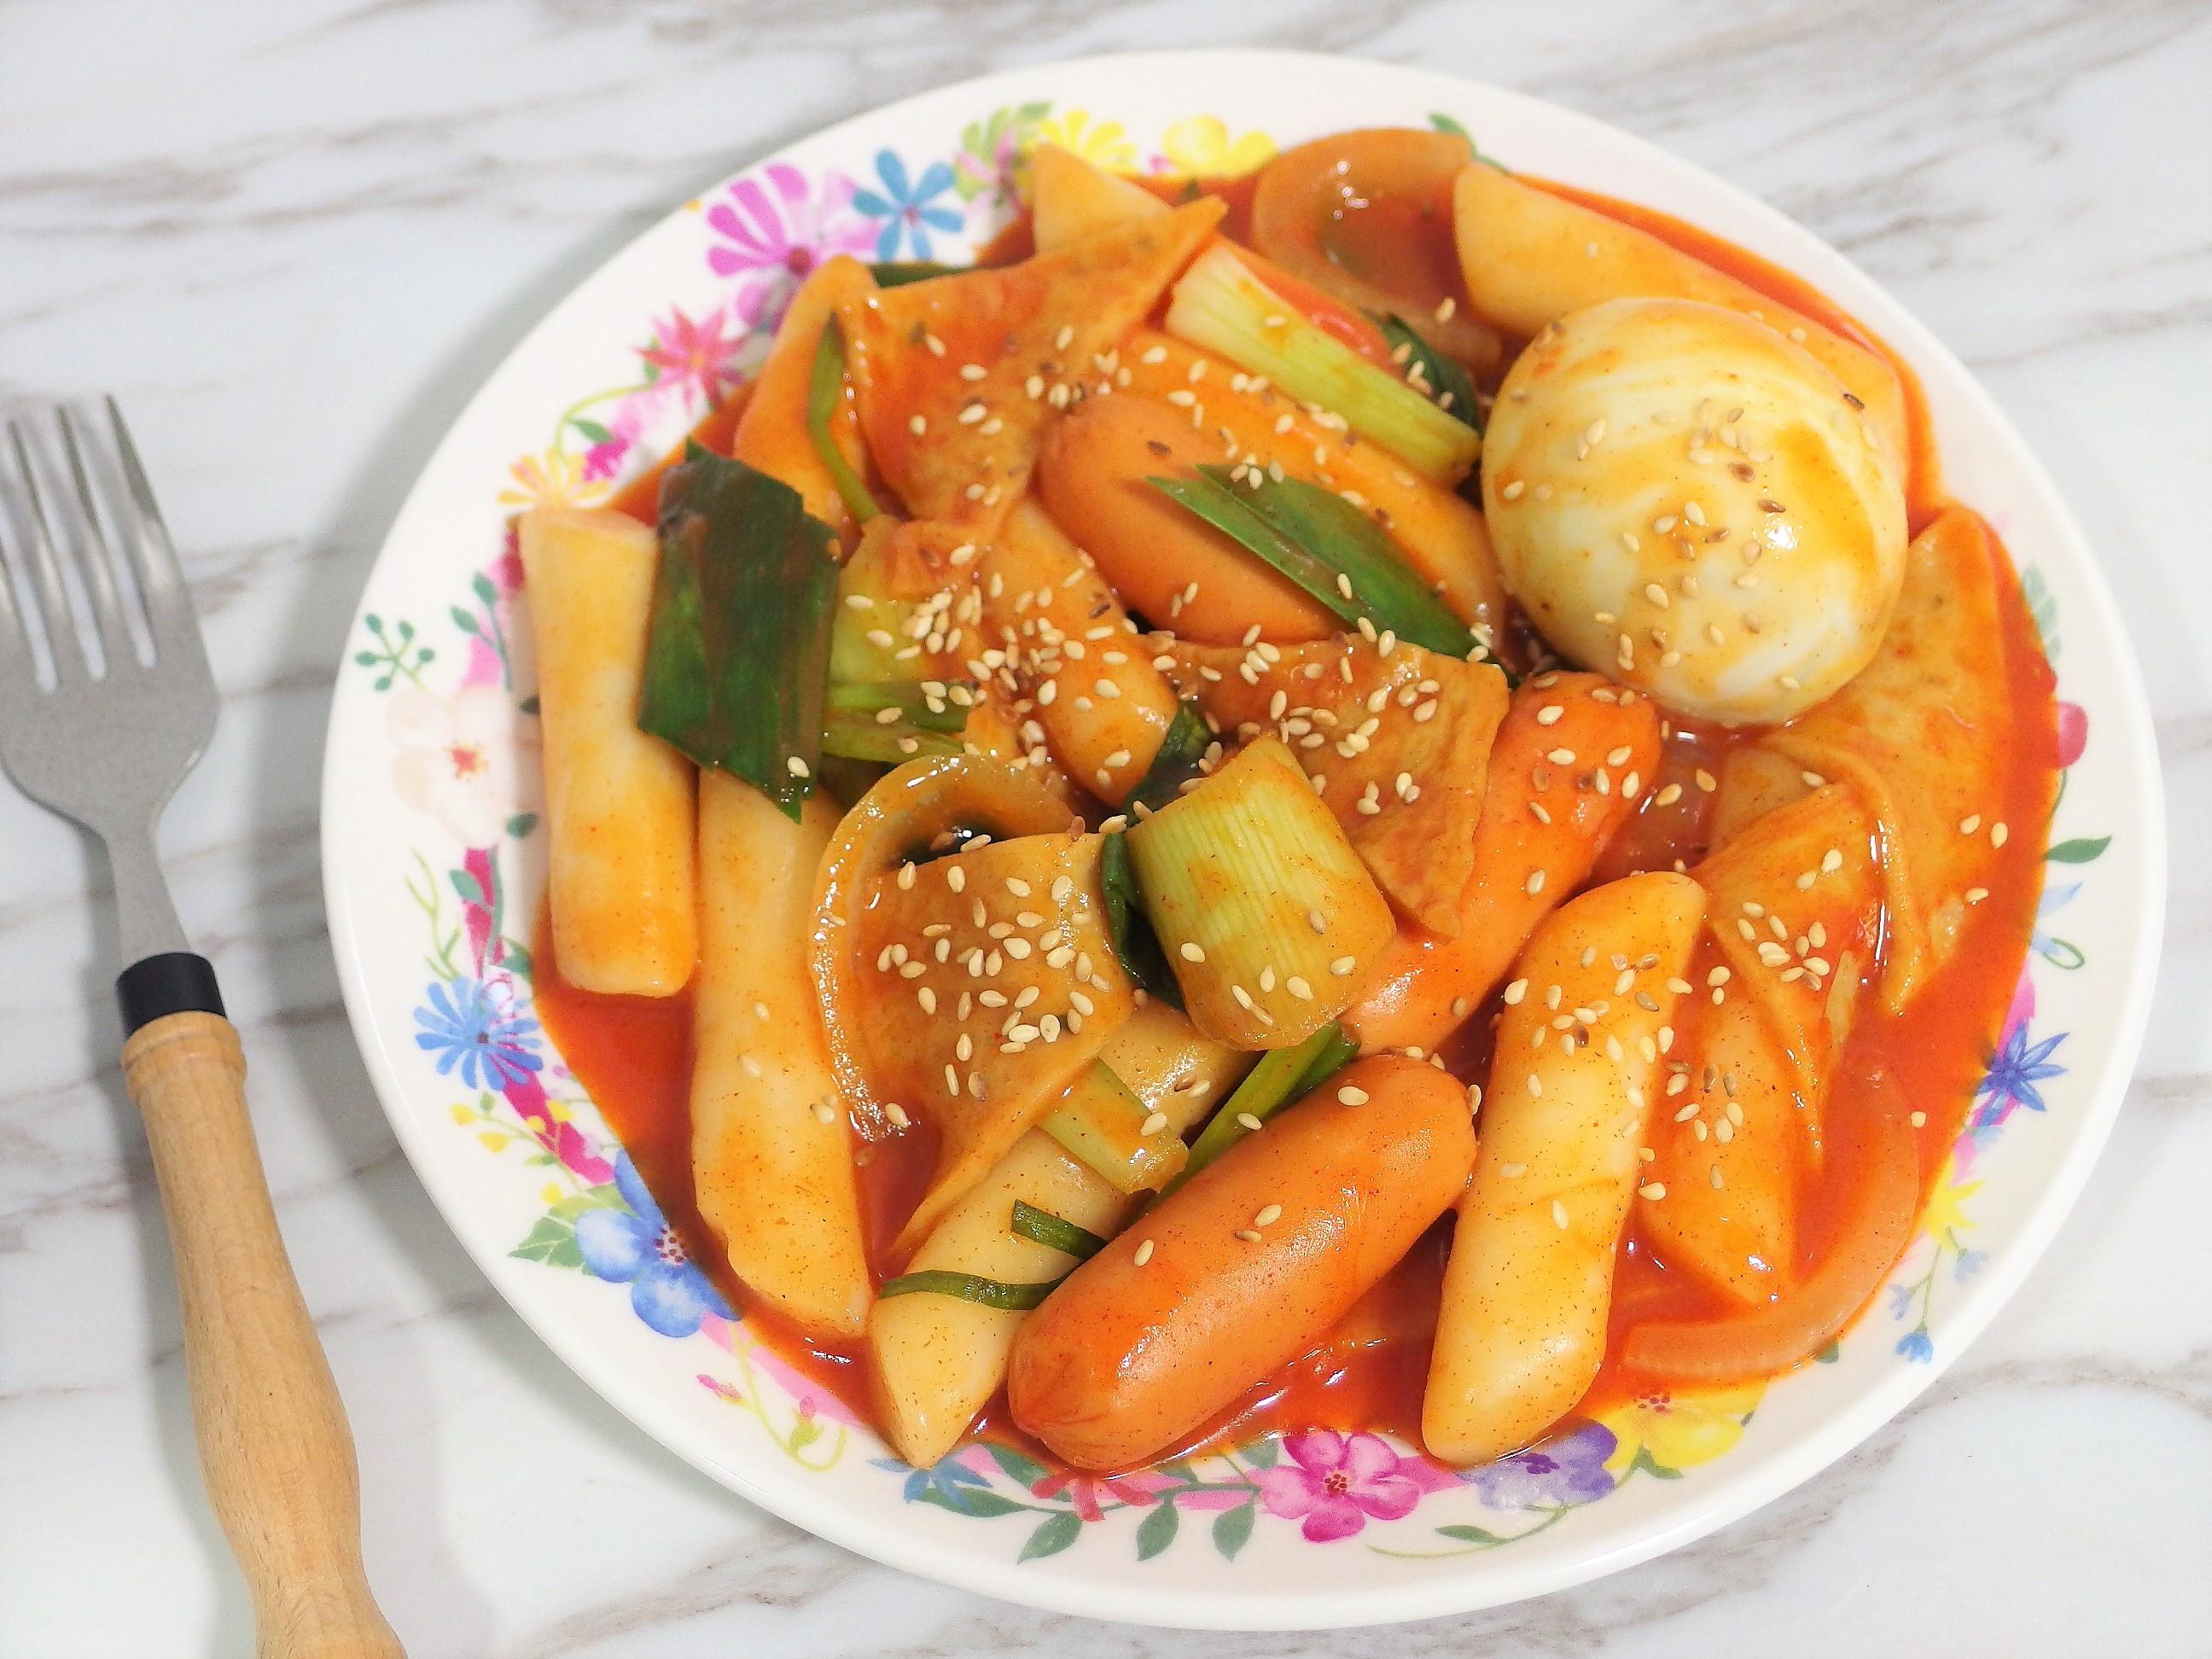 Tteokbokki Recipe - Spicy Korean Rice Cakes